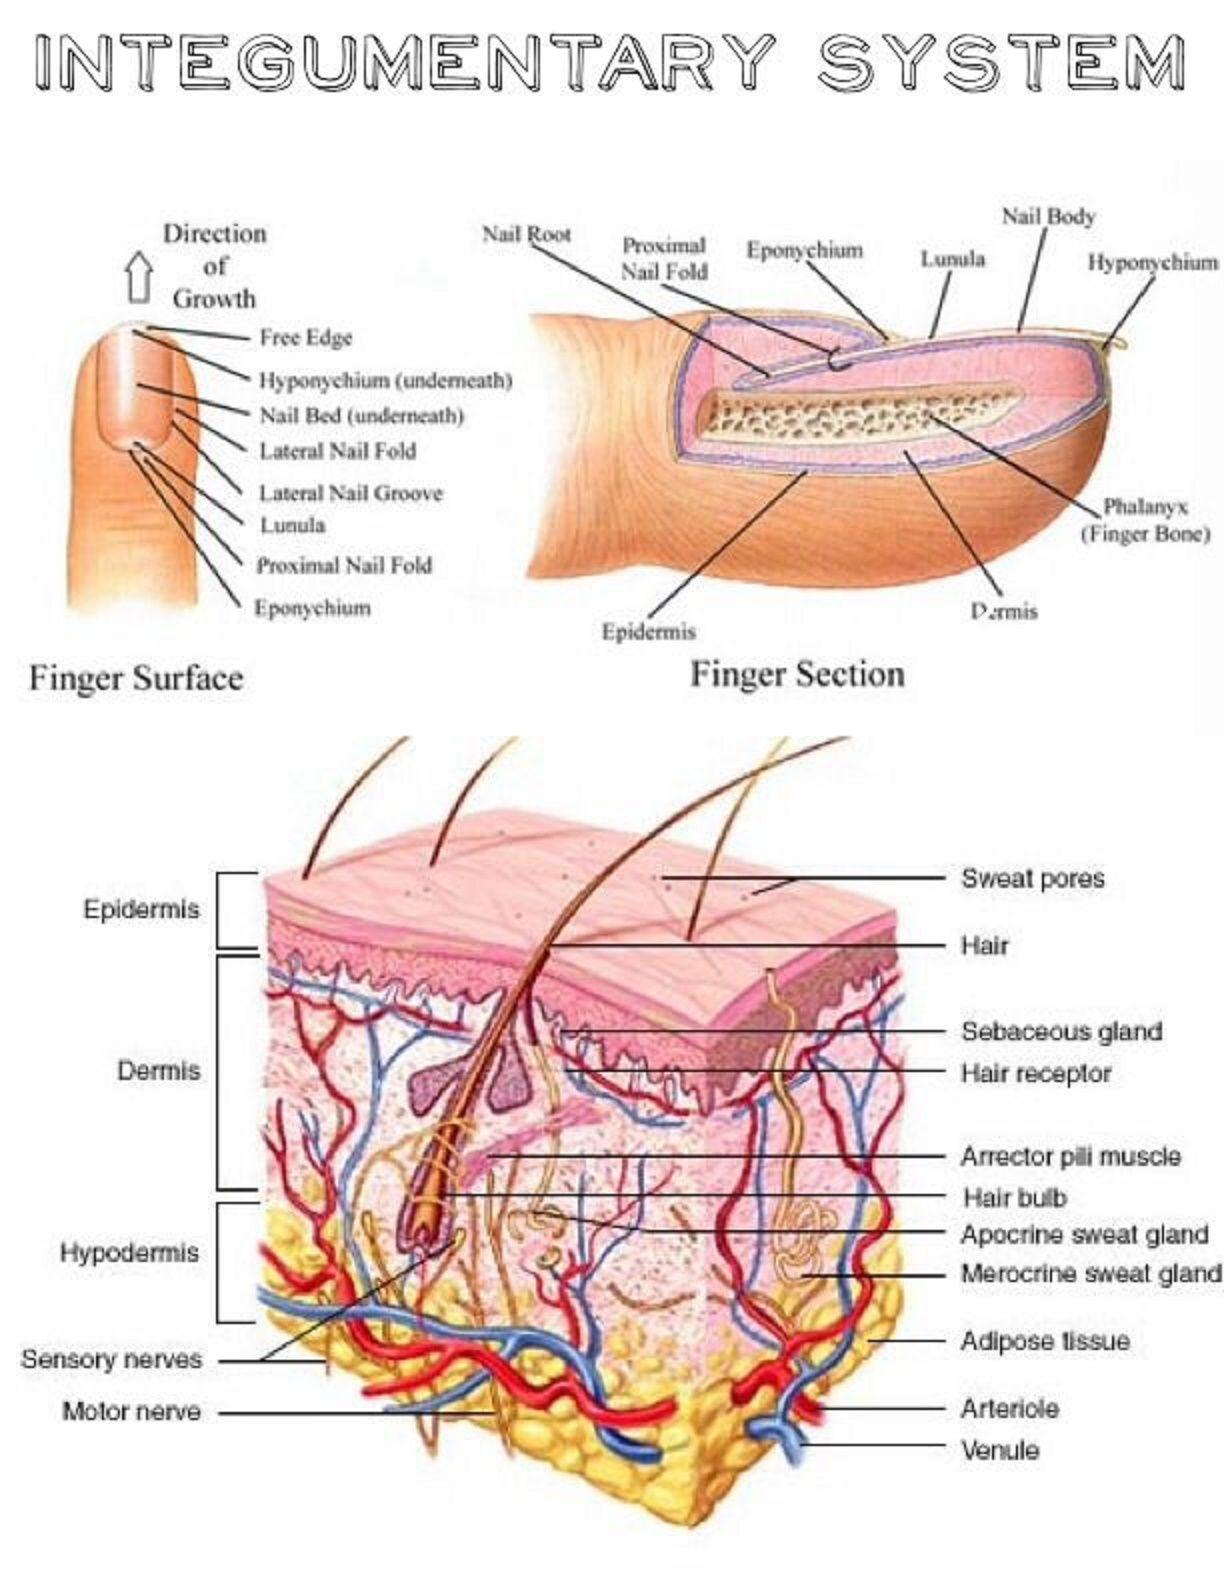 nursing notes human integumentary system podiatry layers of skin  [ 1224 x 1584 Pixel ]